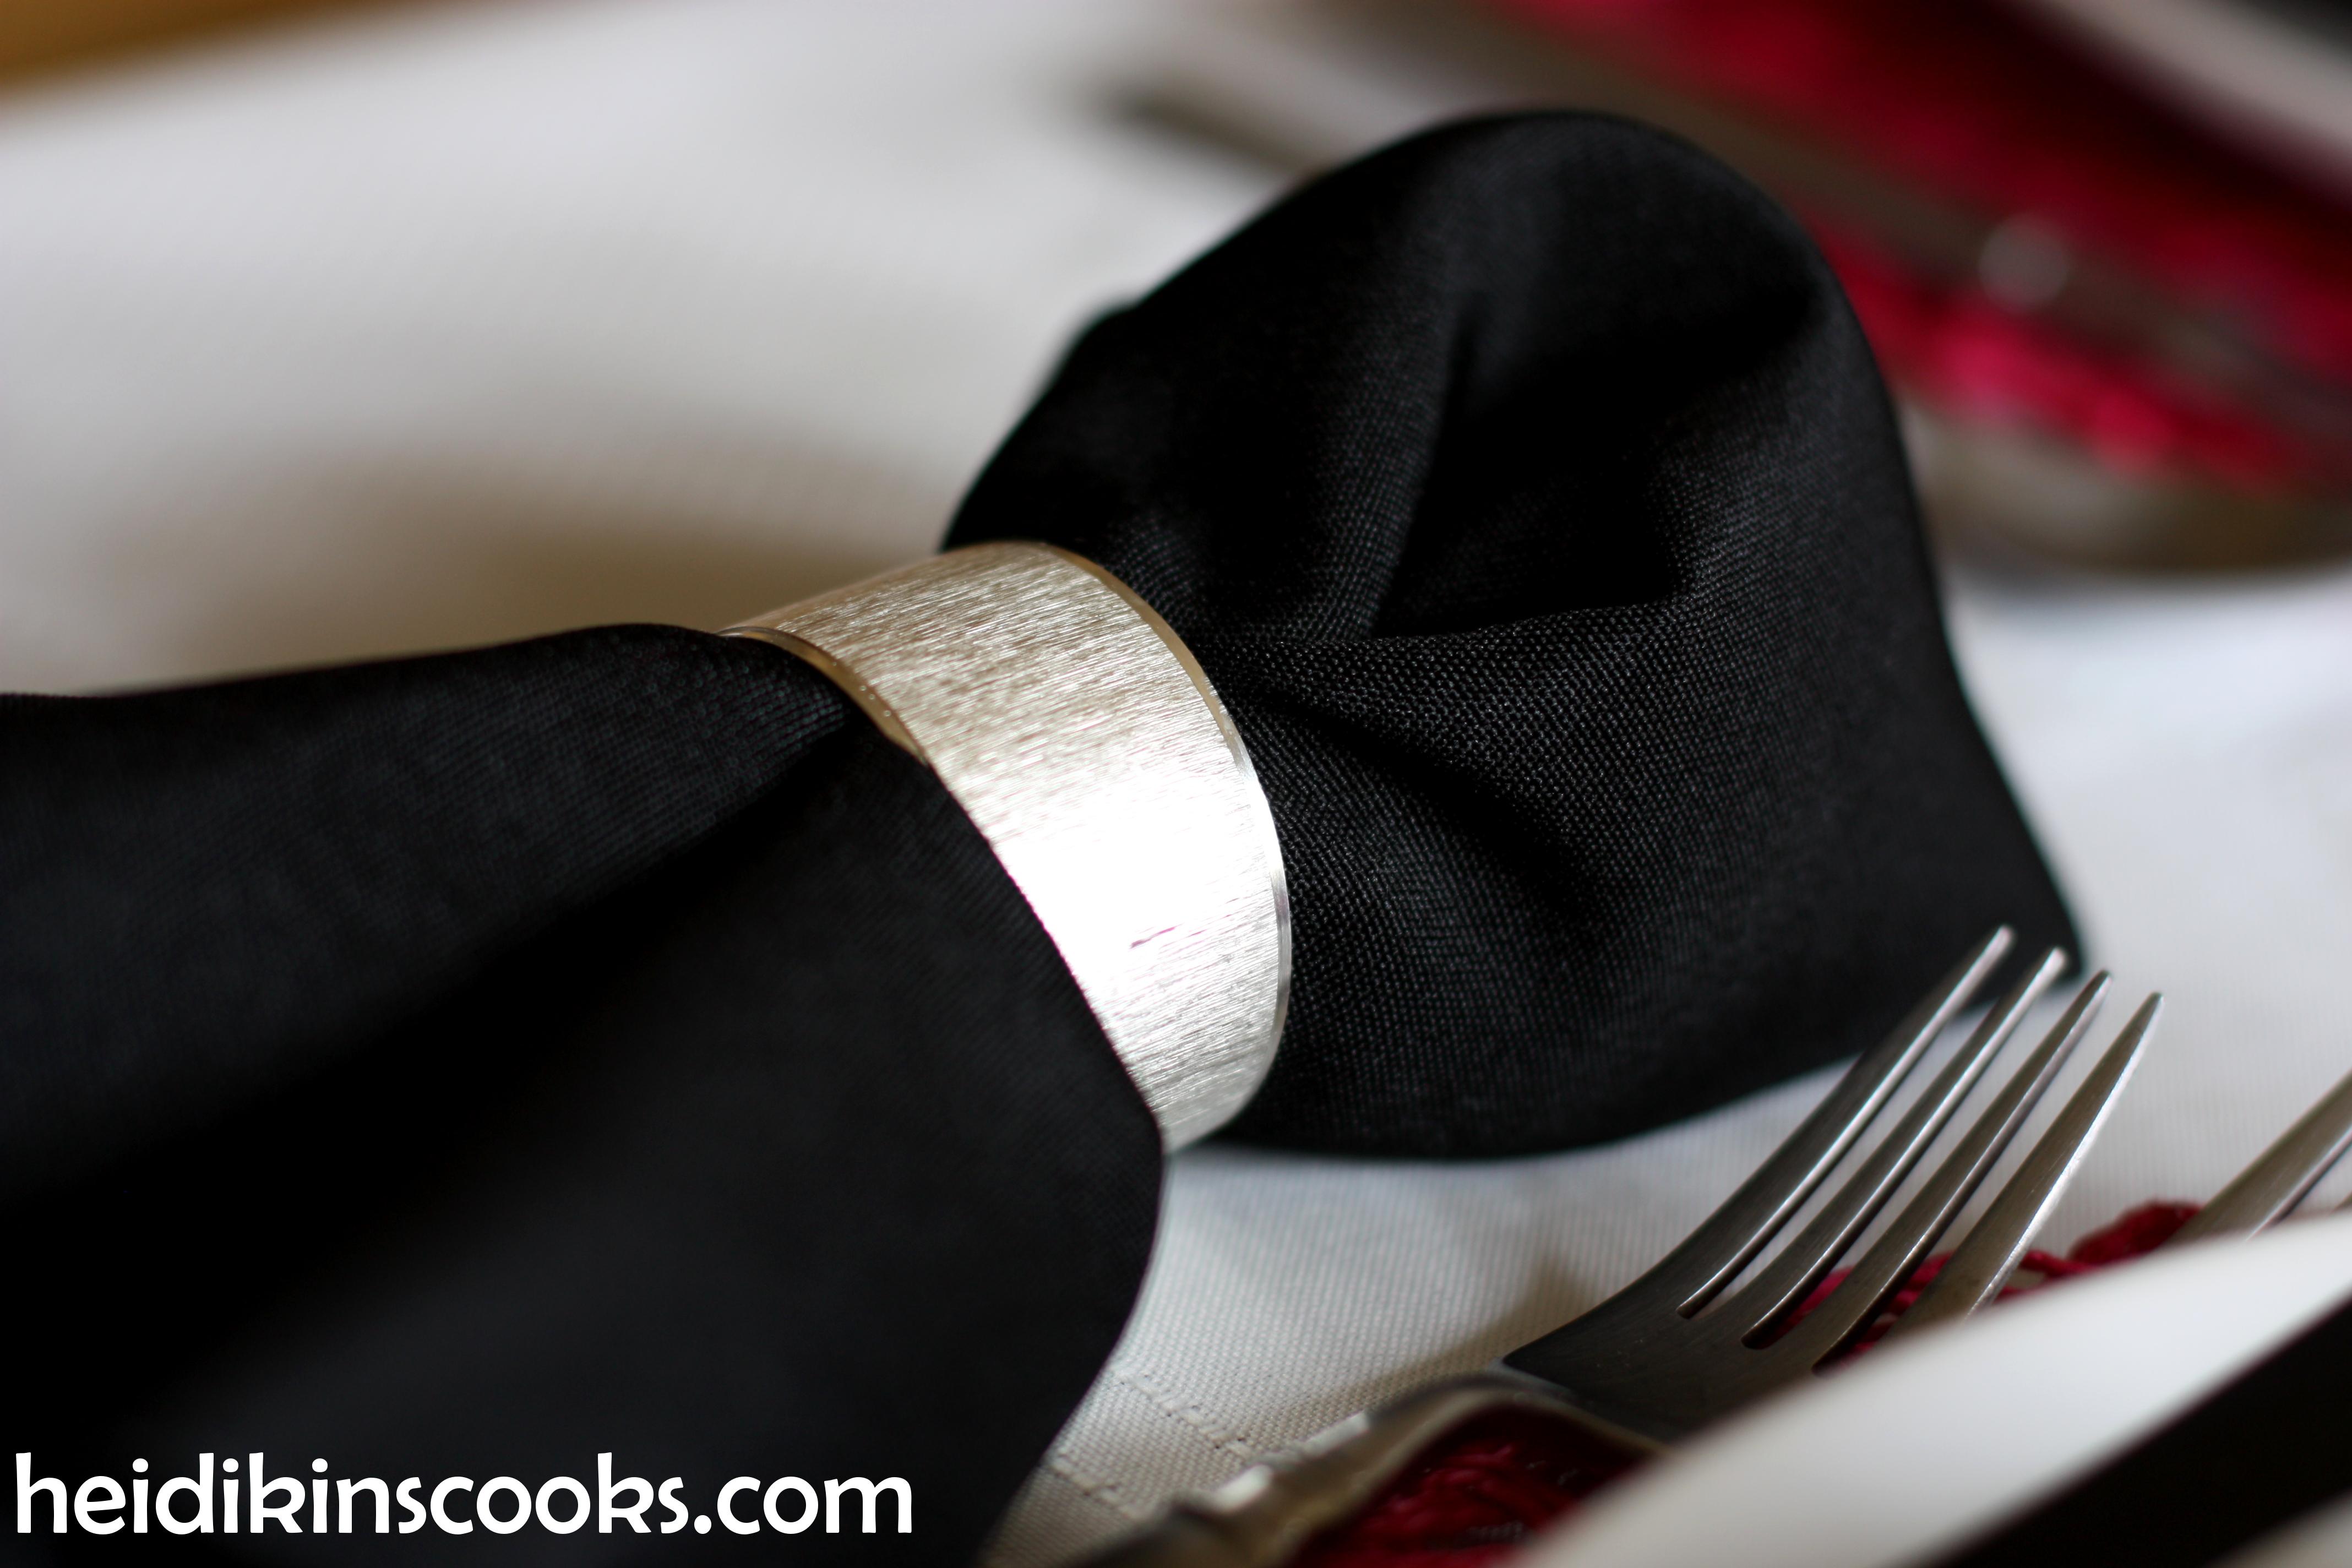 Black And White Stripe Table Setting Heidikins Cooks